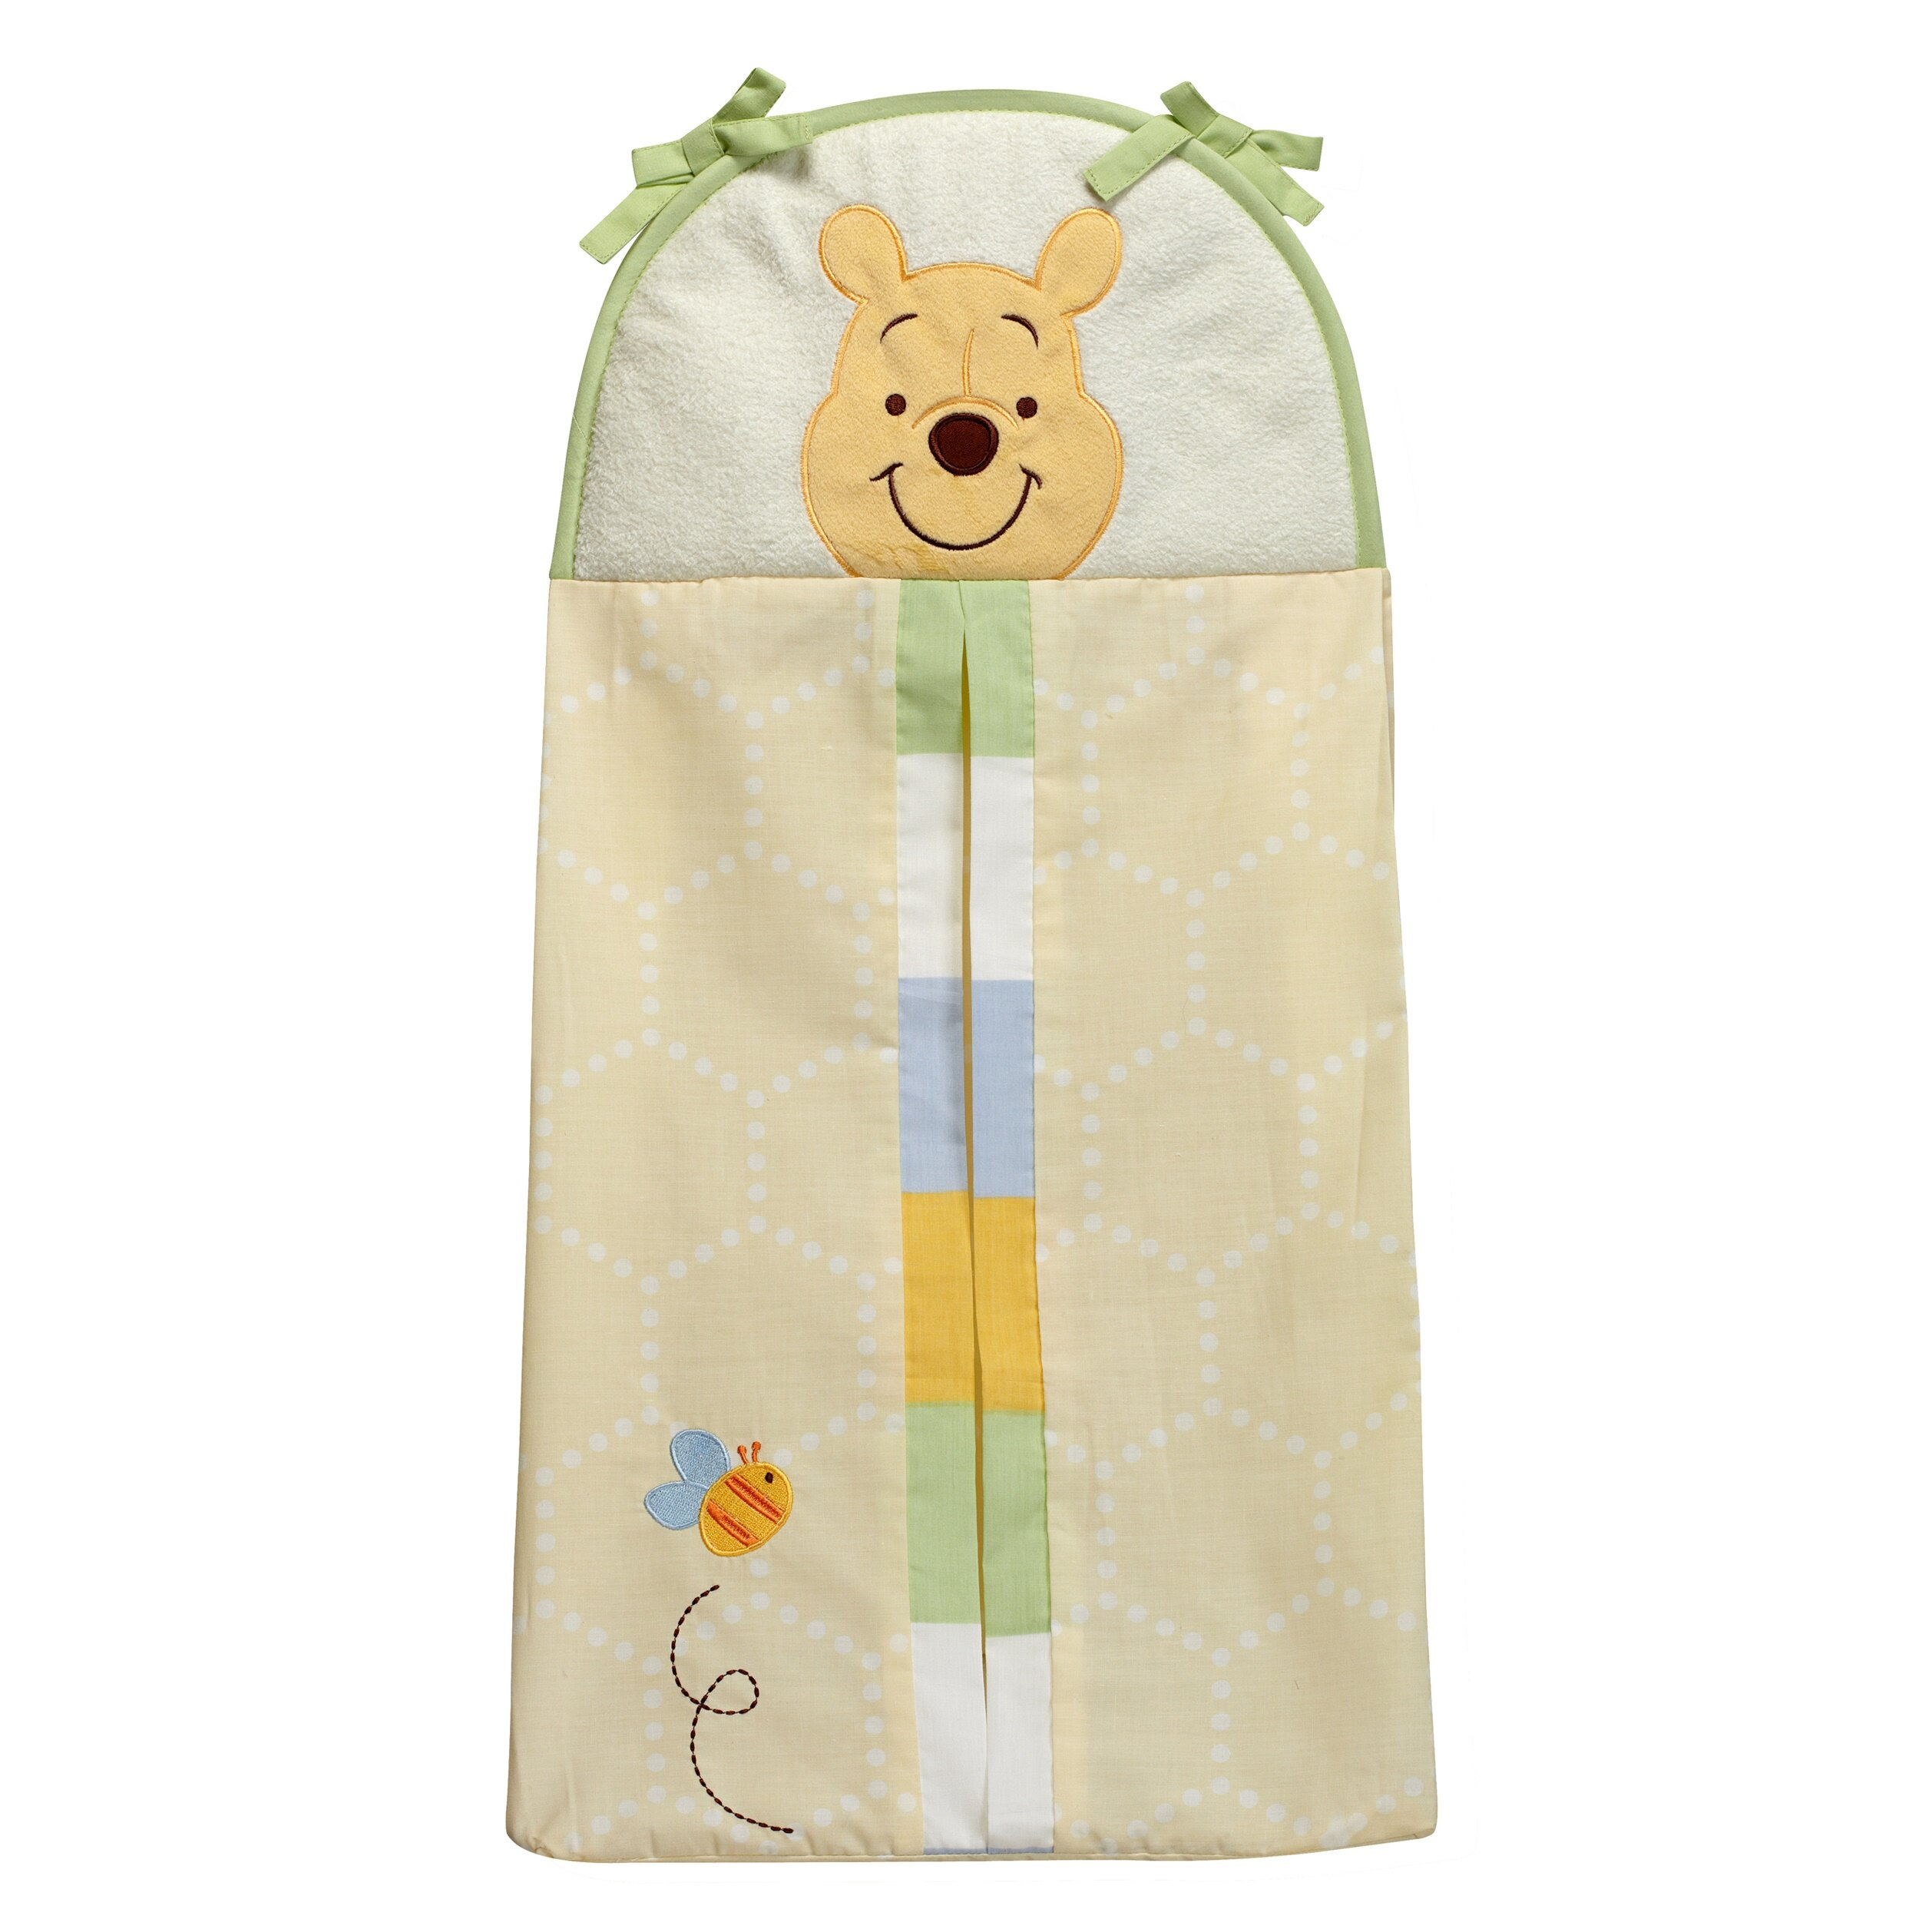 Disney Winnie the Pooh Outdoor Patio Set Blue